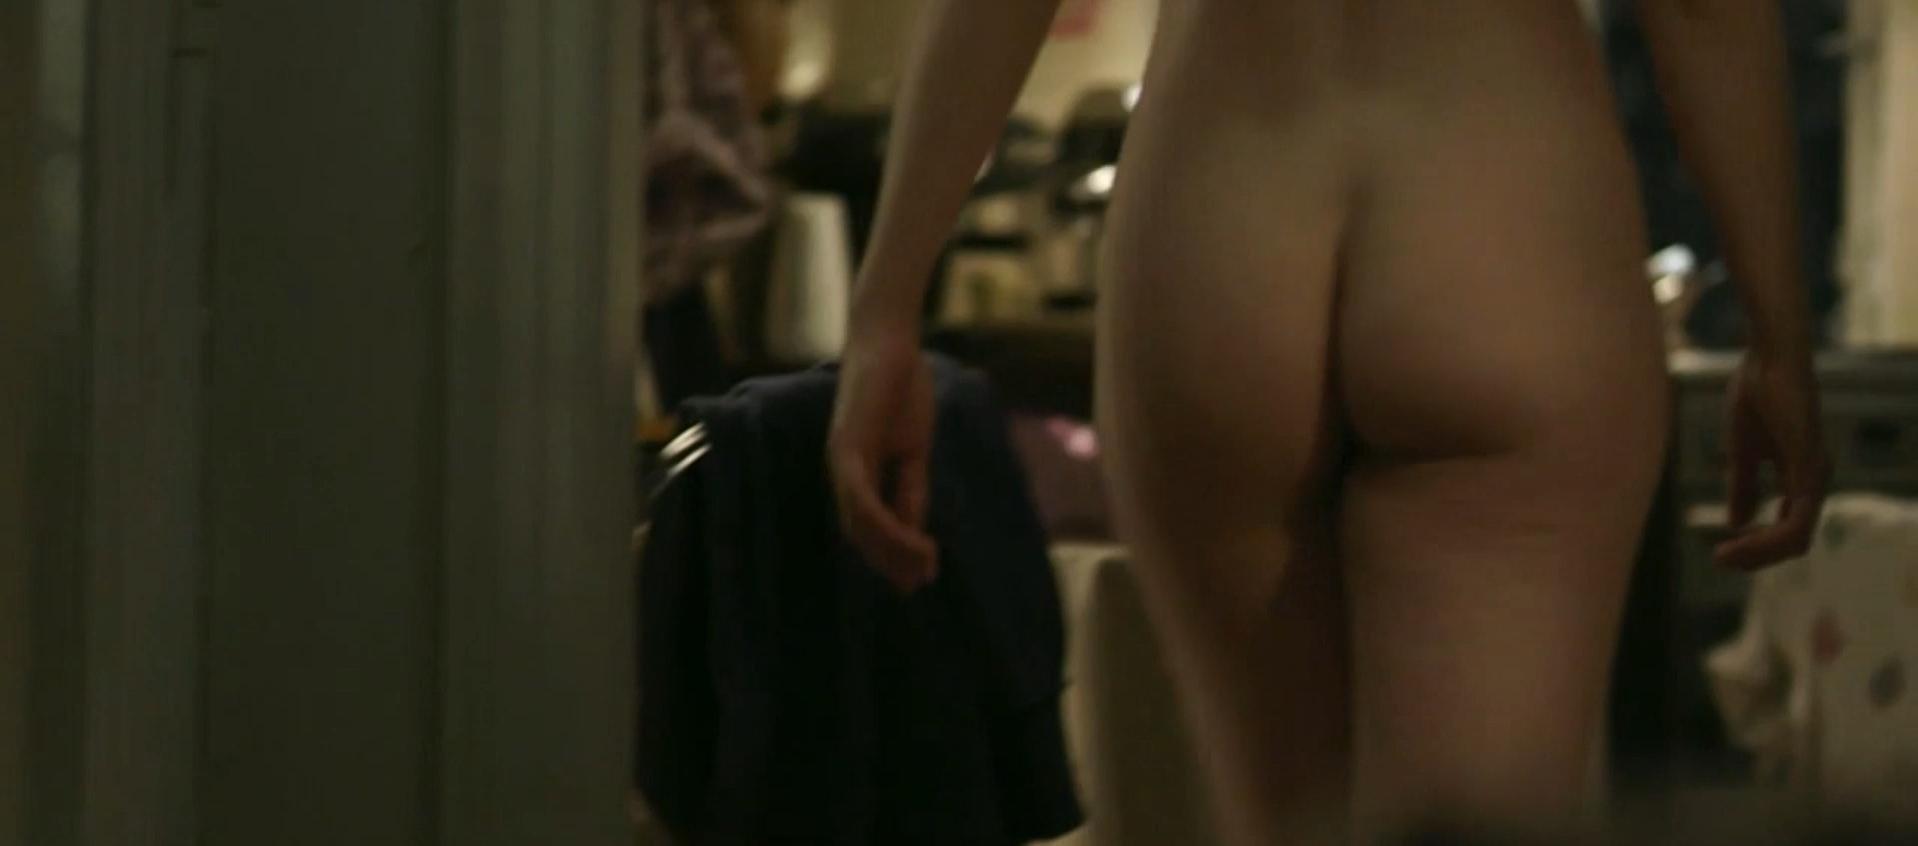 Jennifer lopez sex scene the boy next door - 2 part 6